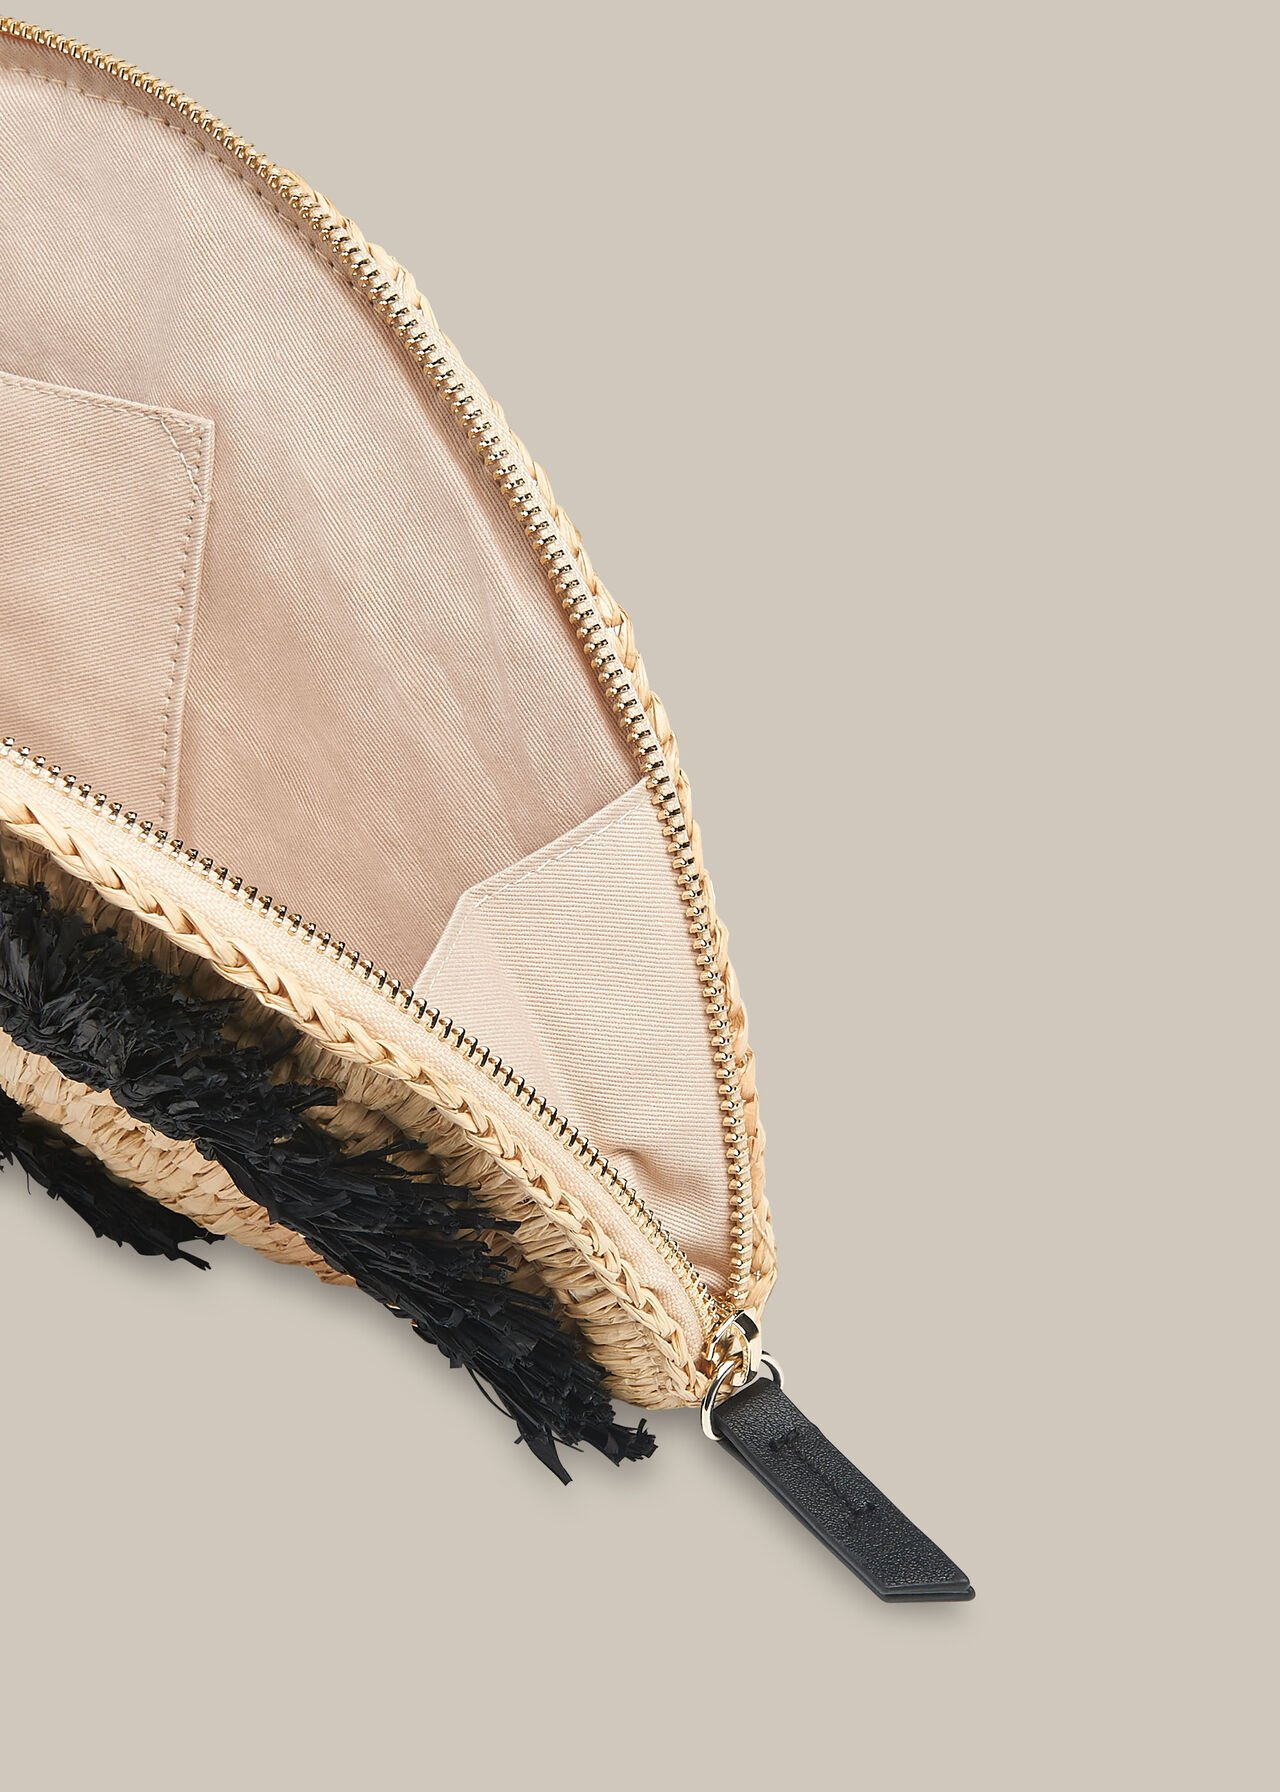 Santino Fringe Straw Clutch Black/Multi